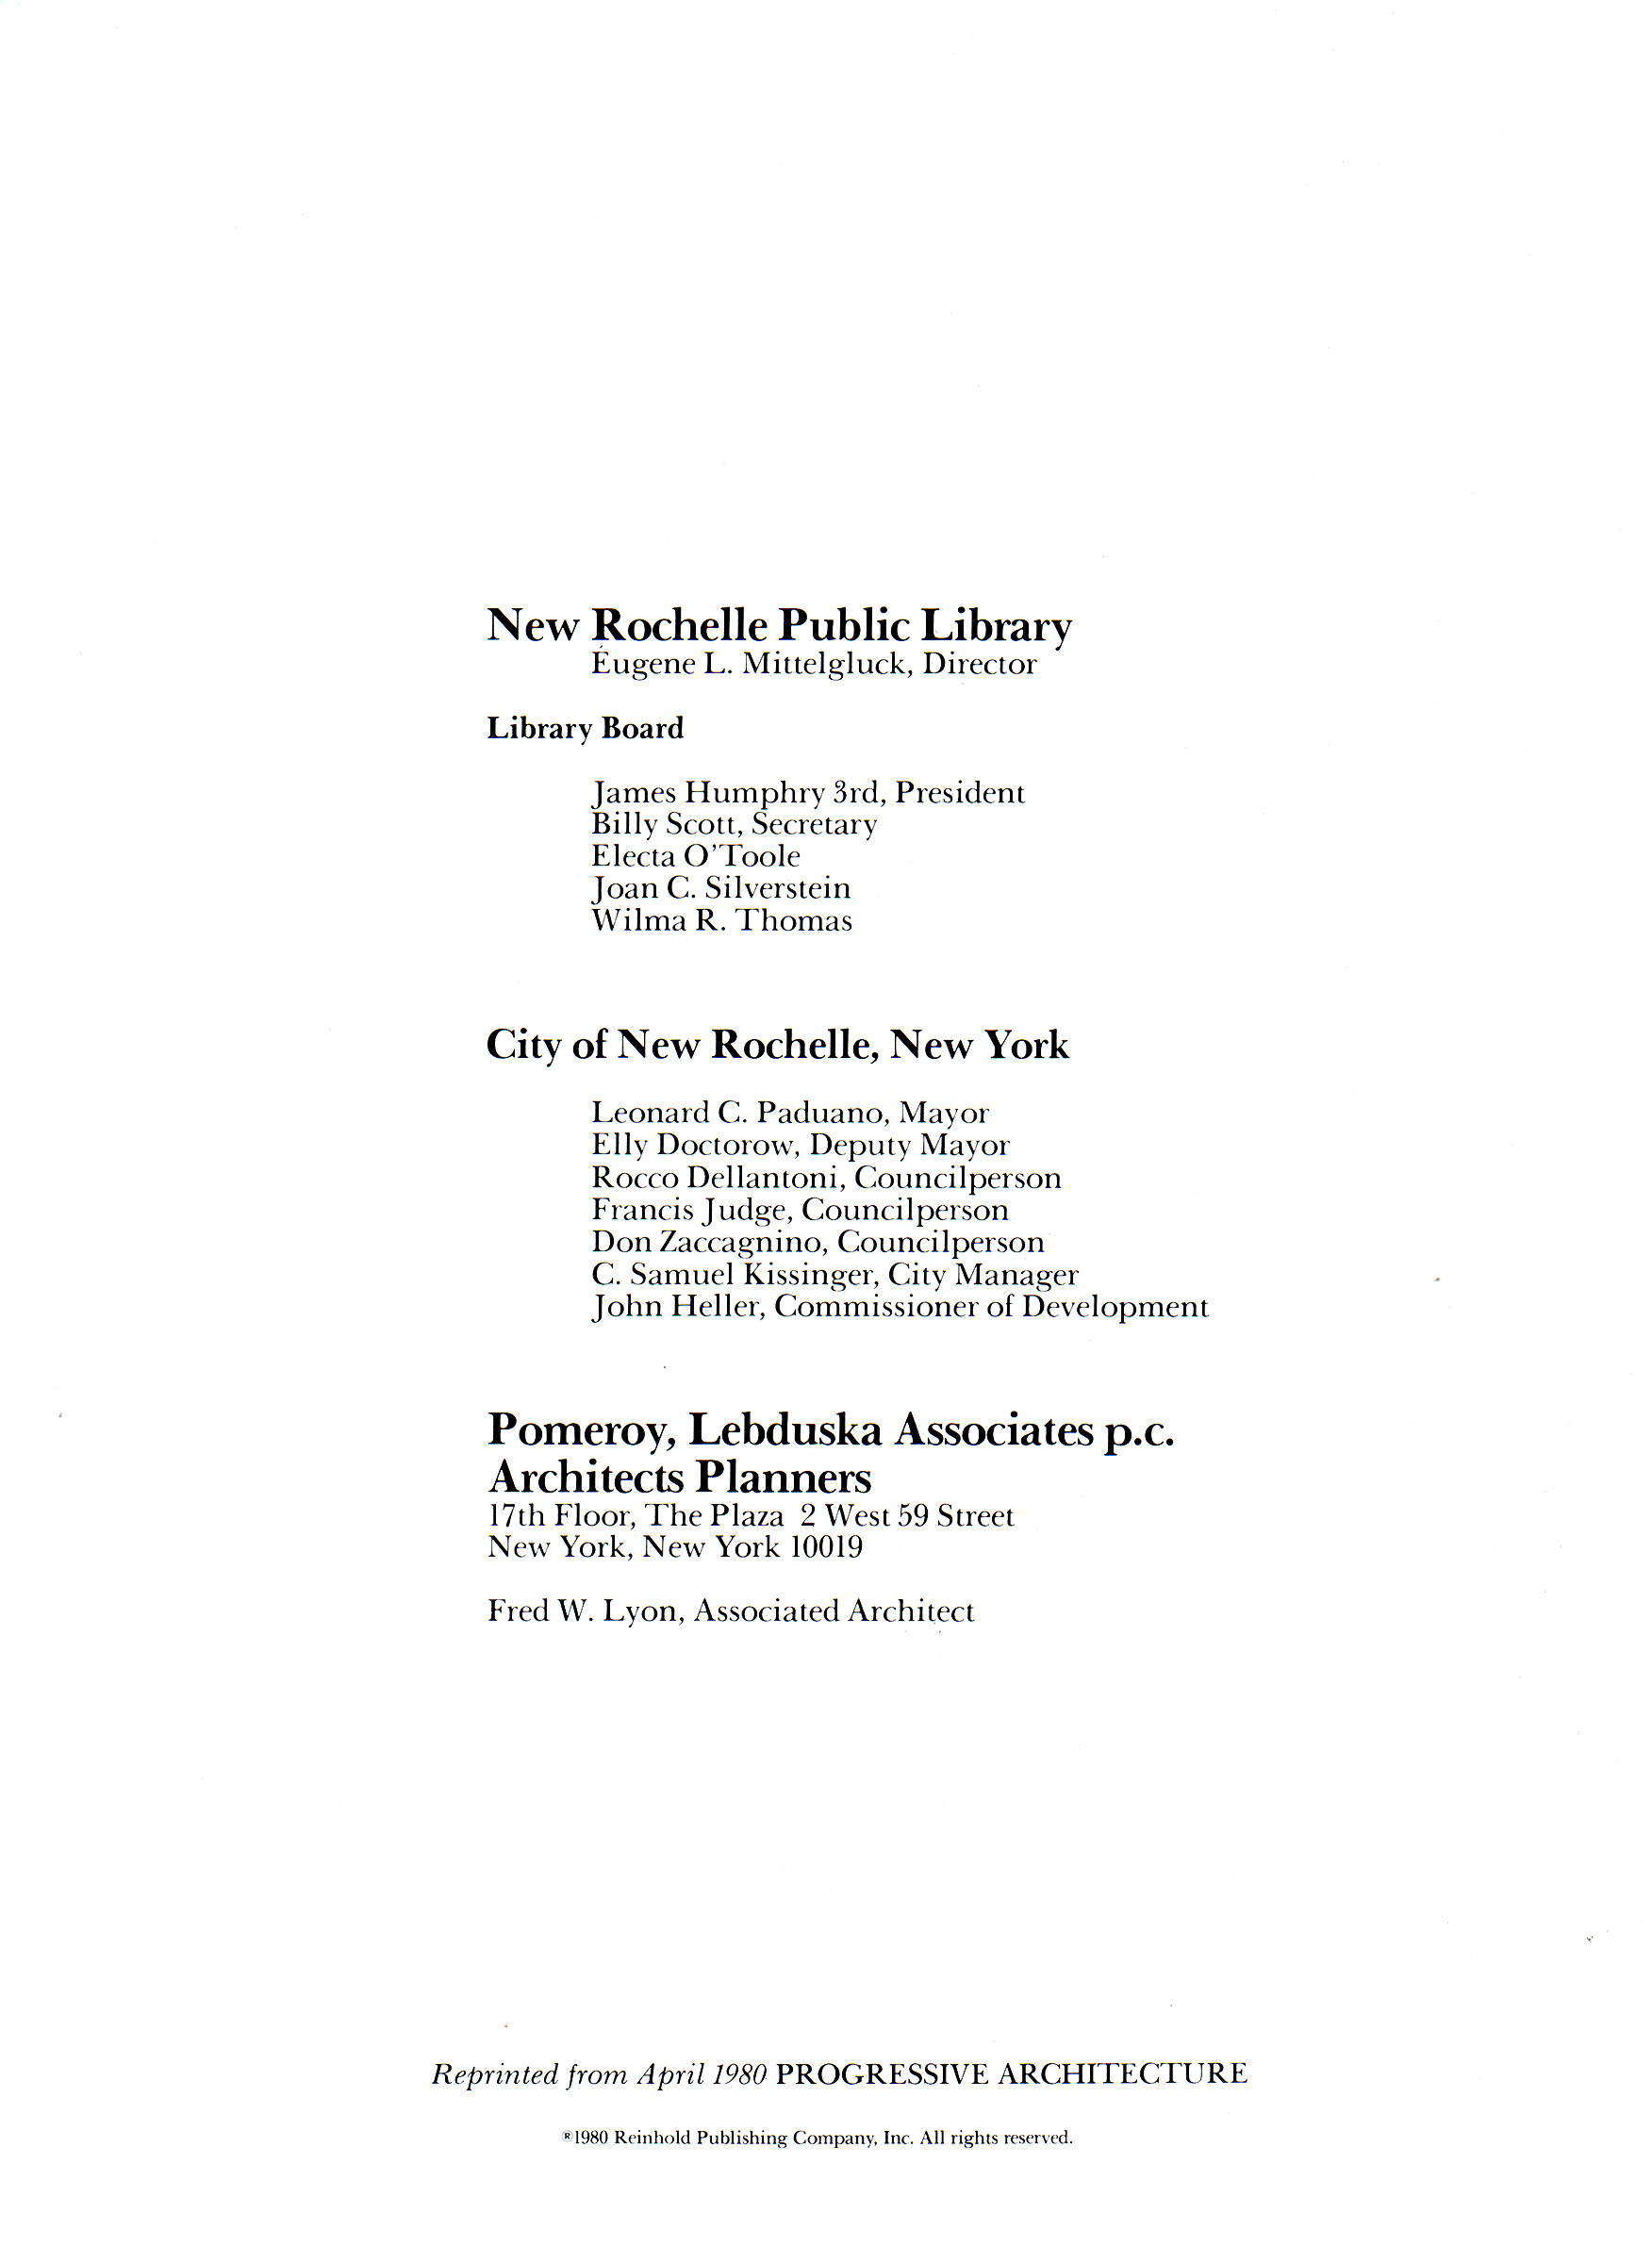 New Rochelle Page 6.jpg